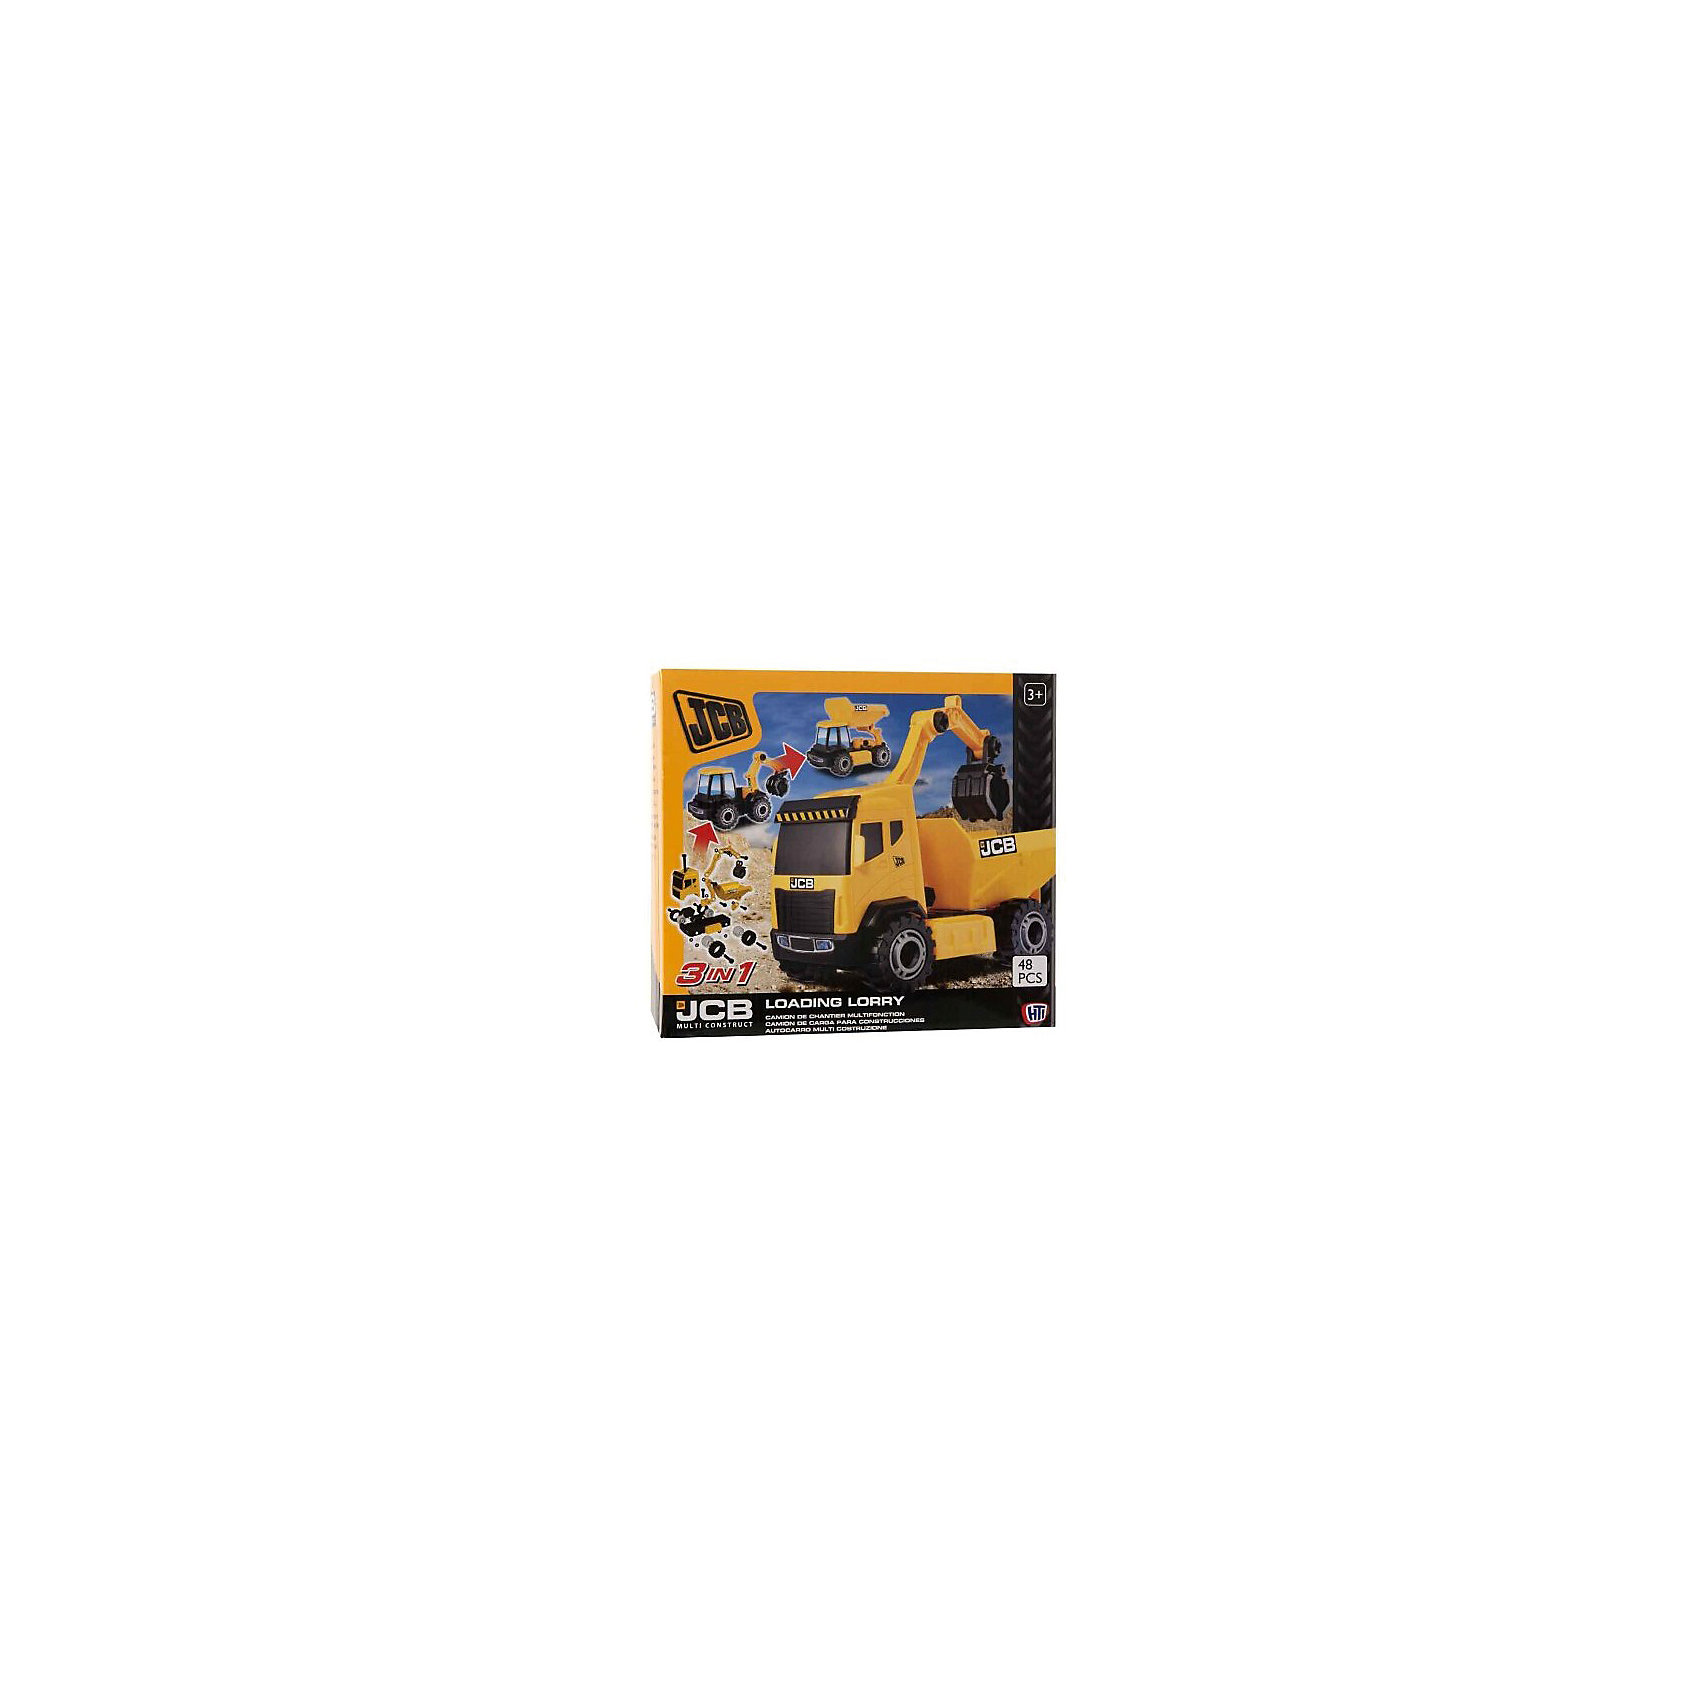 HTI Игровой набор Стройка, JCB плоскогубцы jcb jpl005